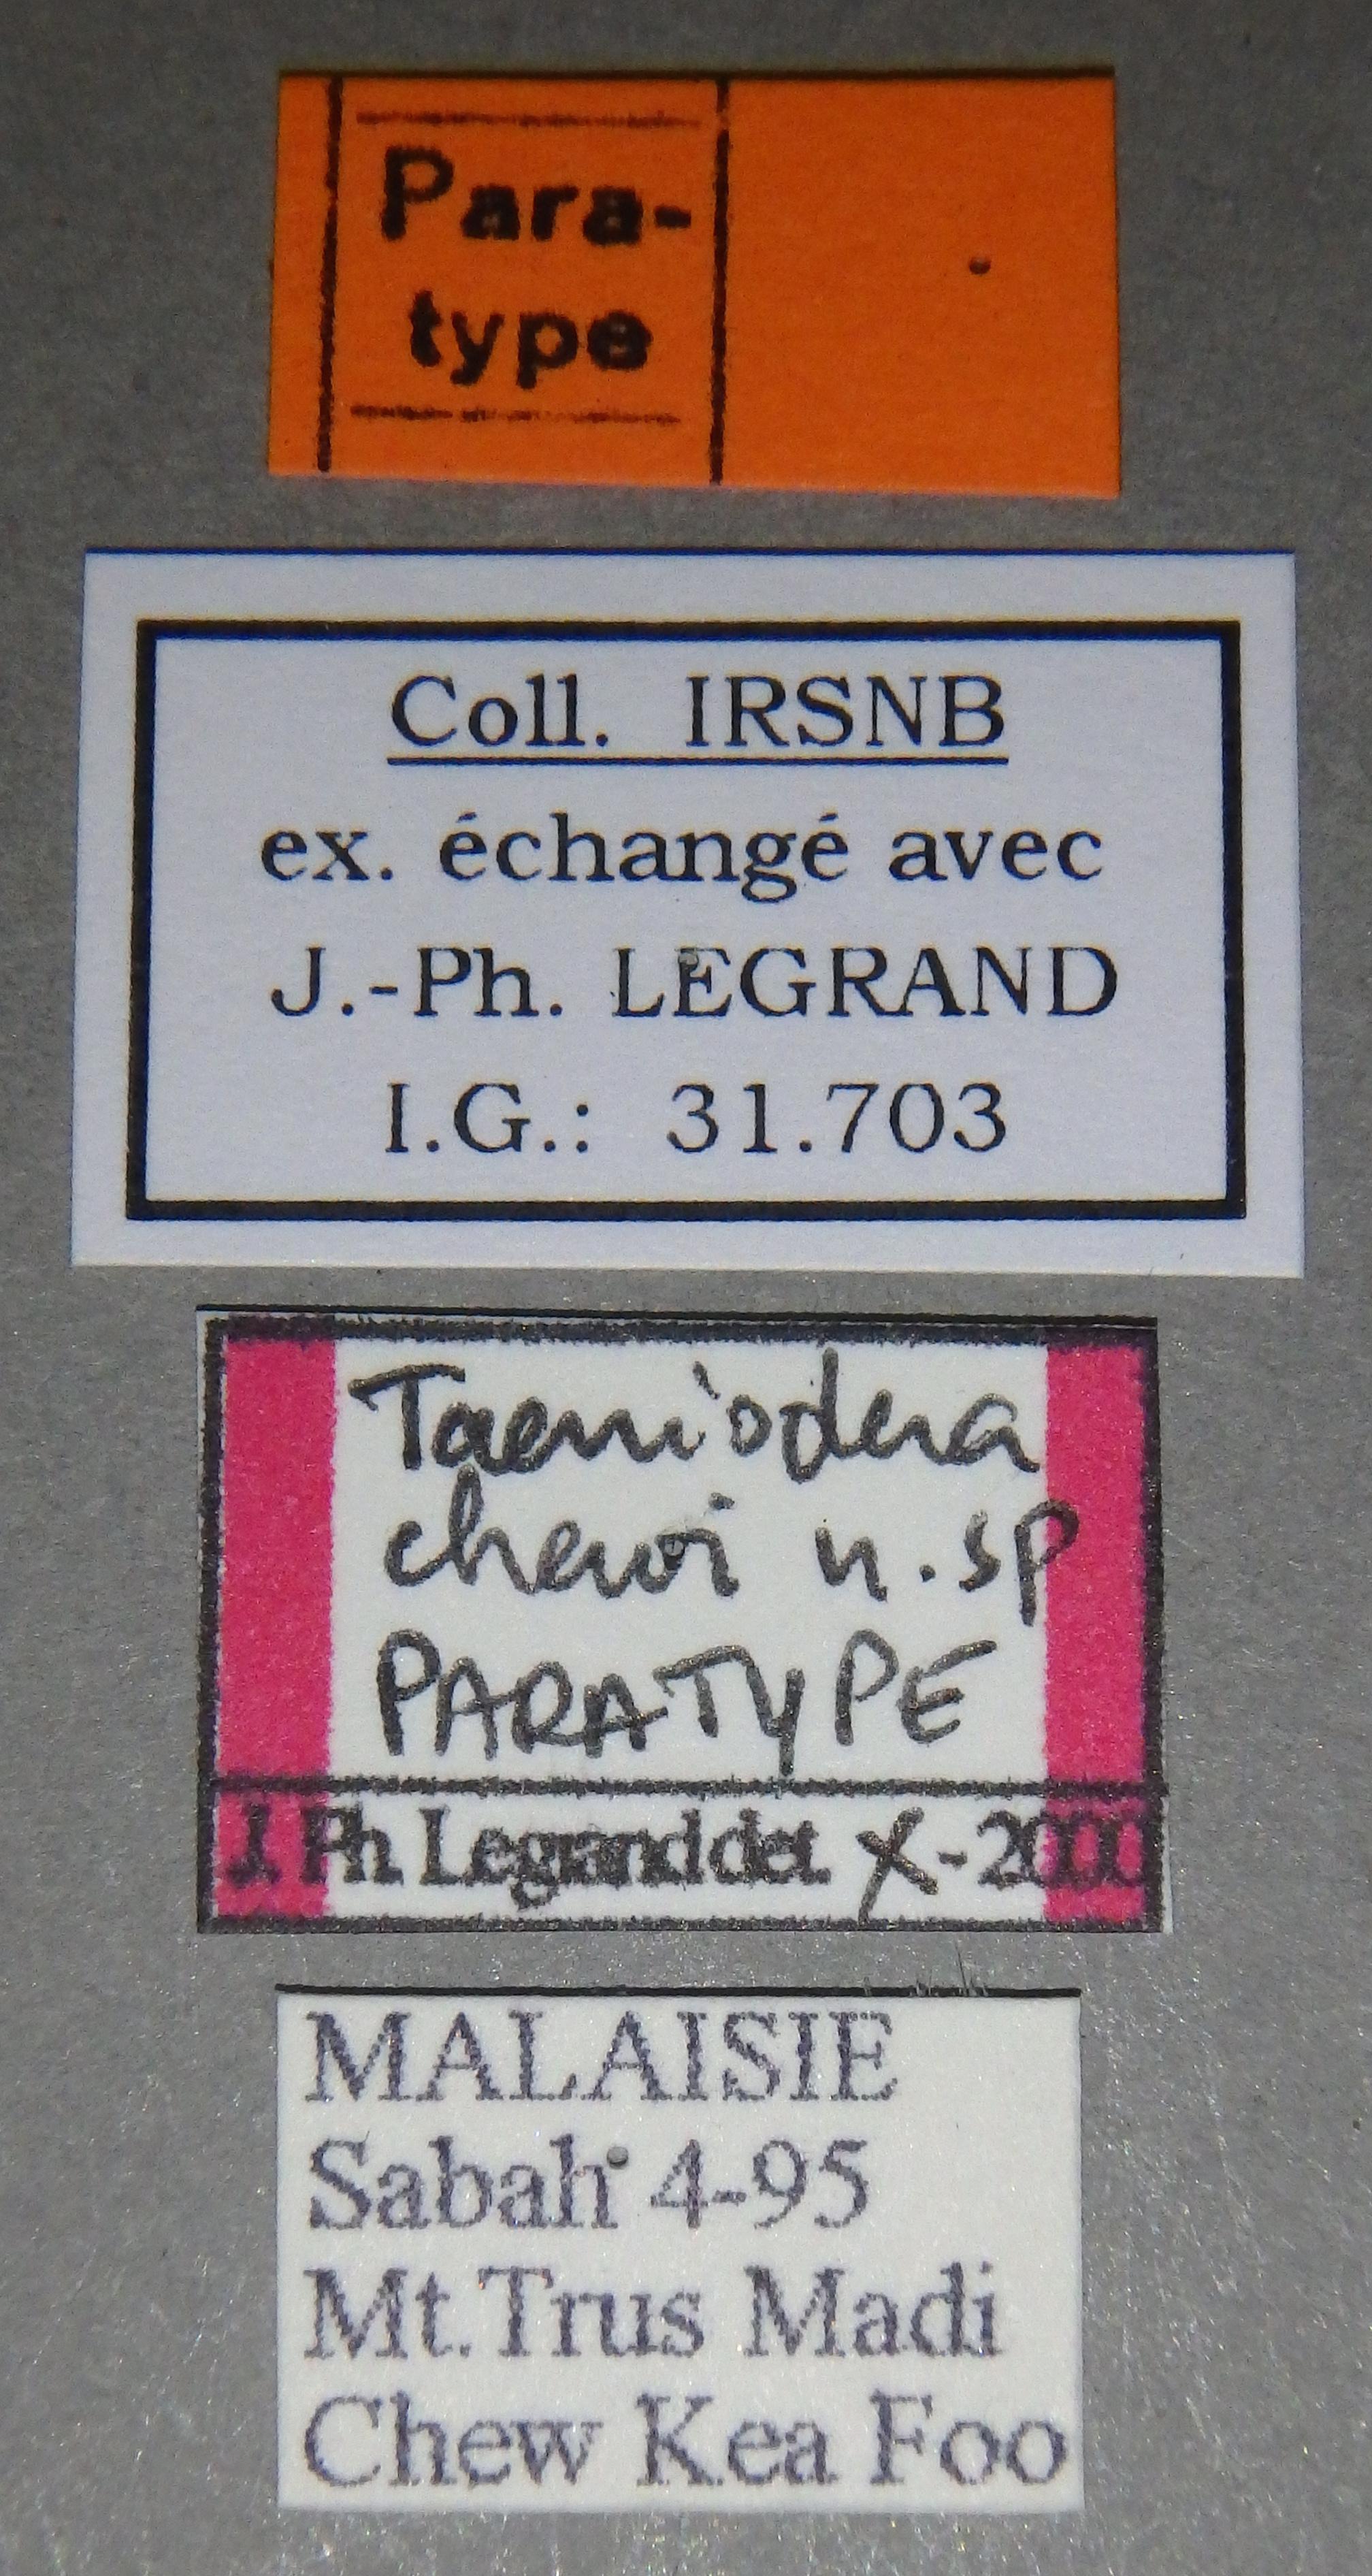 Taeniodera chewi pt2 Lb.JPG